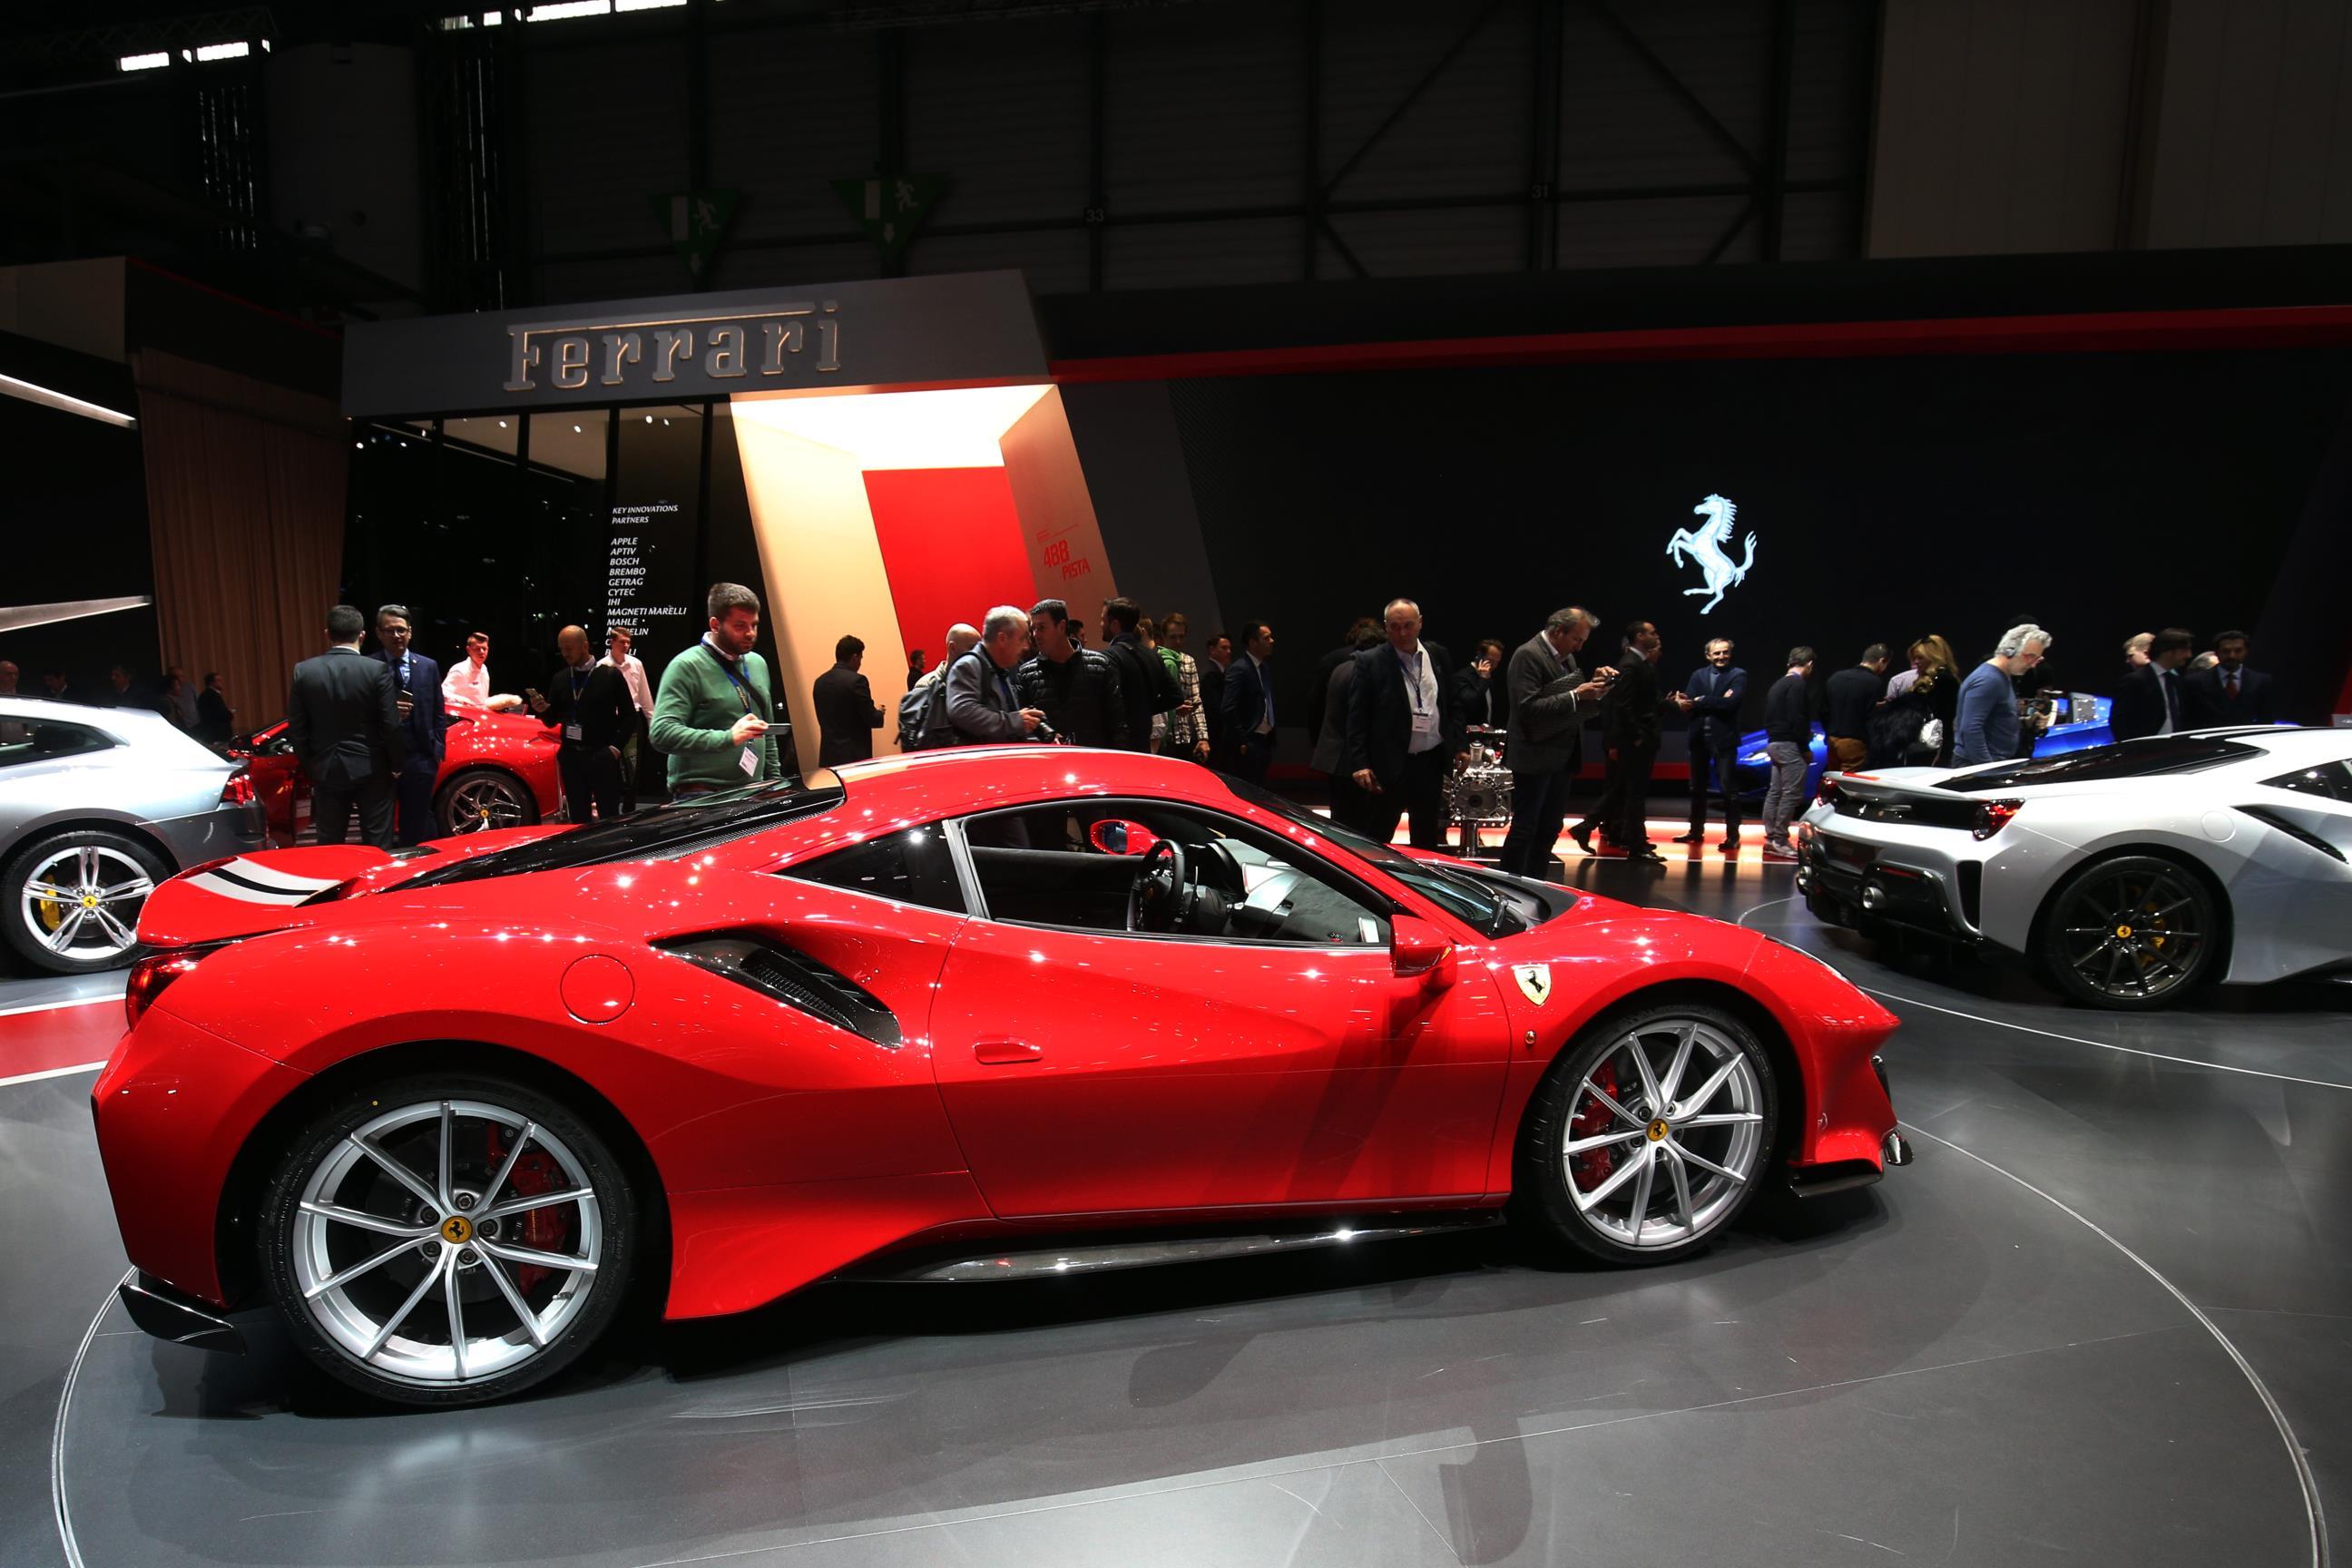 Geneva Motor Show 2018 Mega Gallery Part 1 (11)